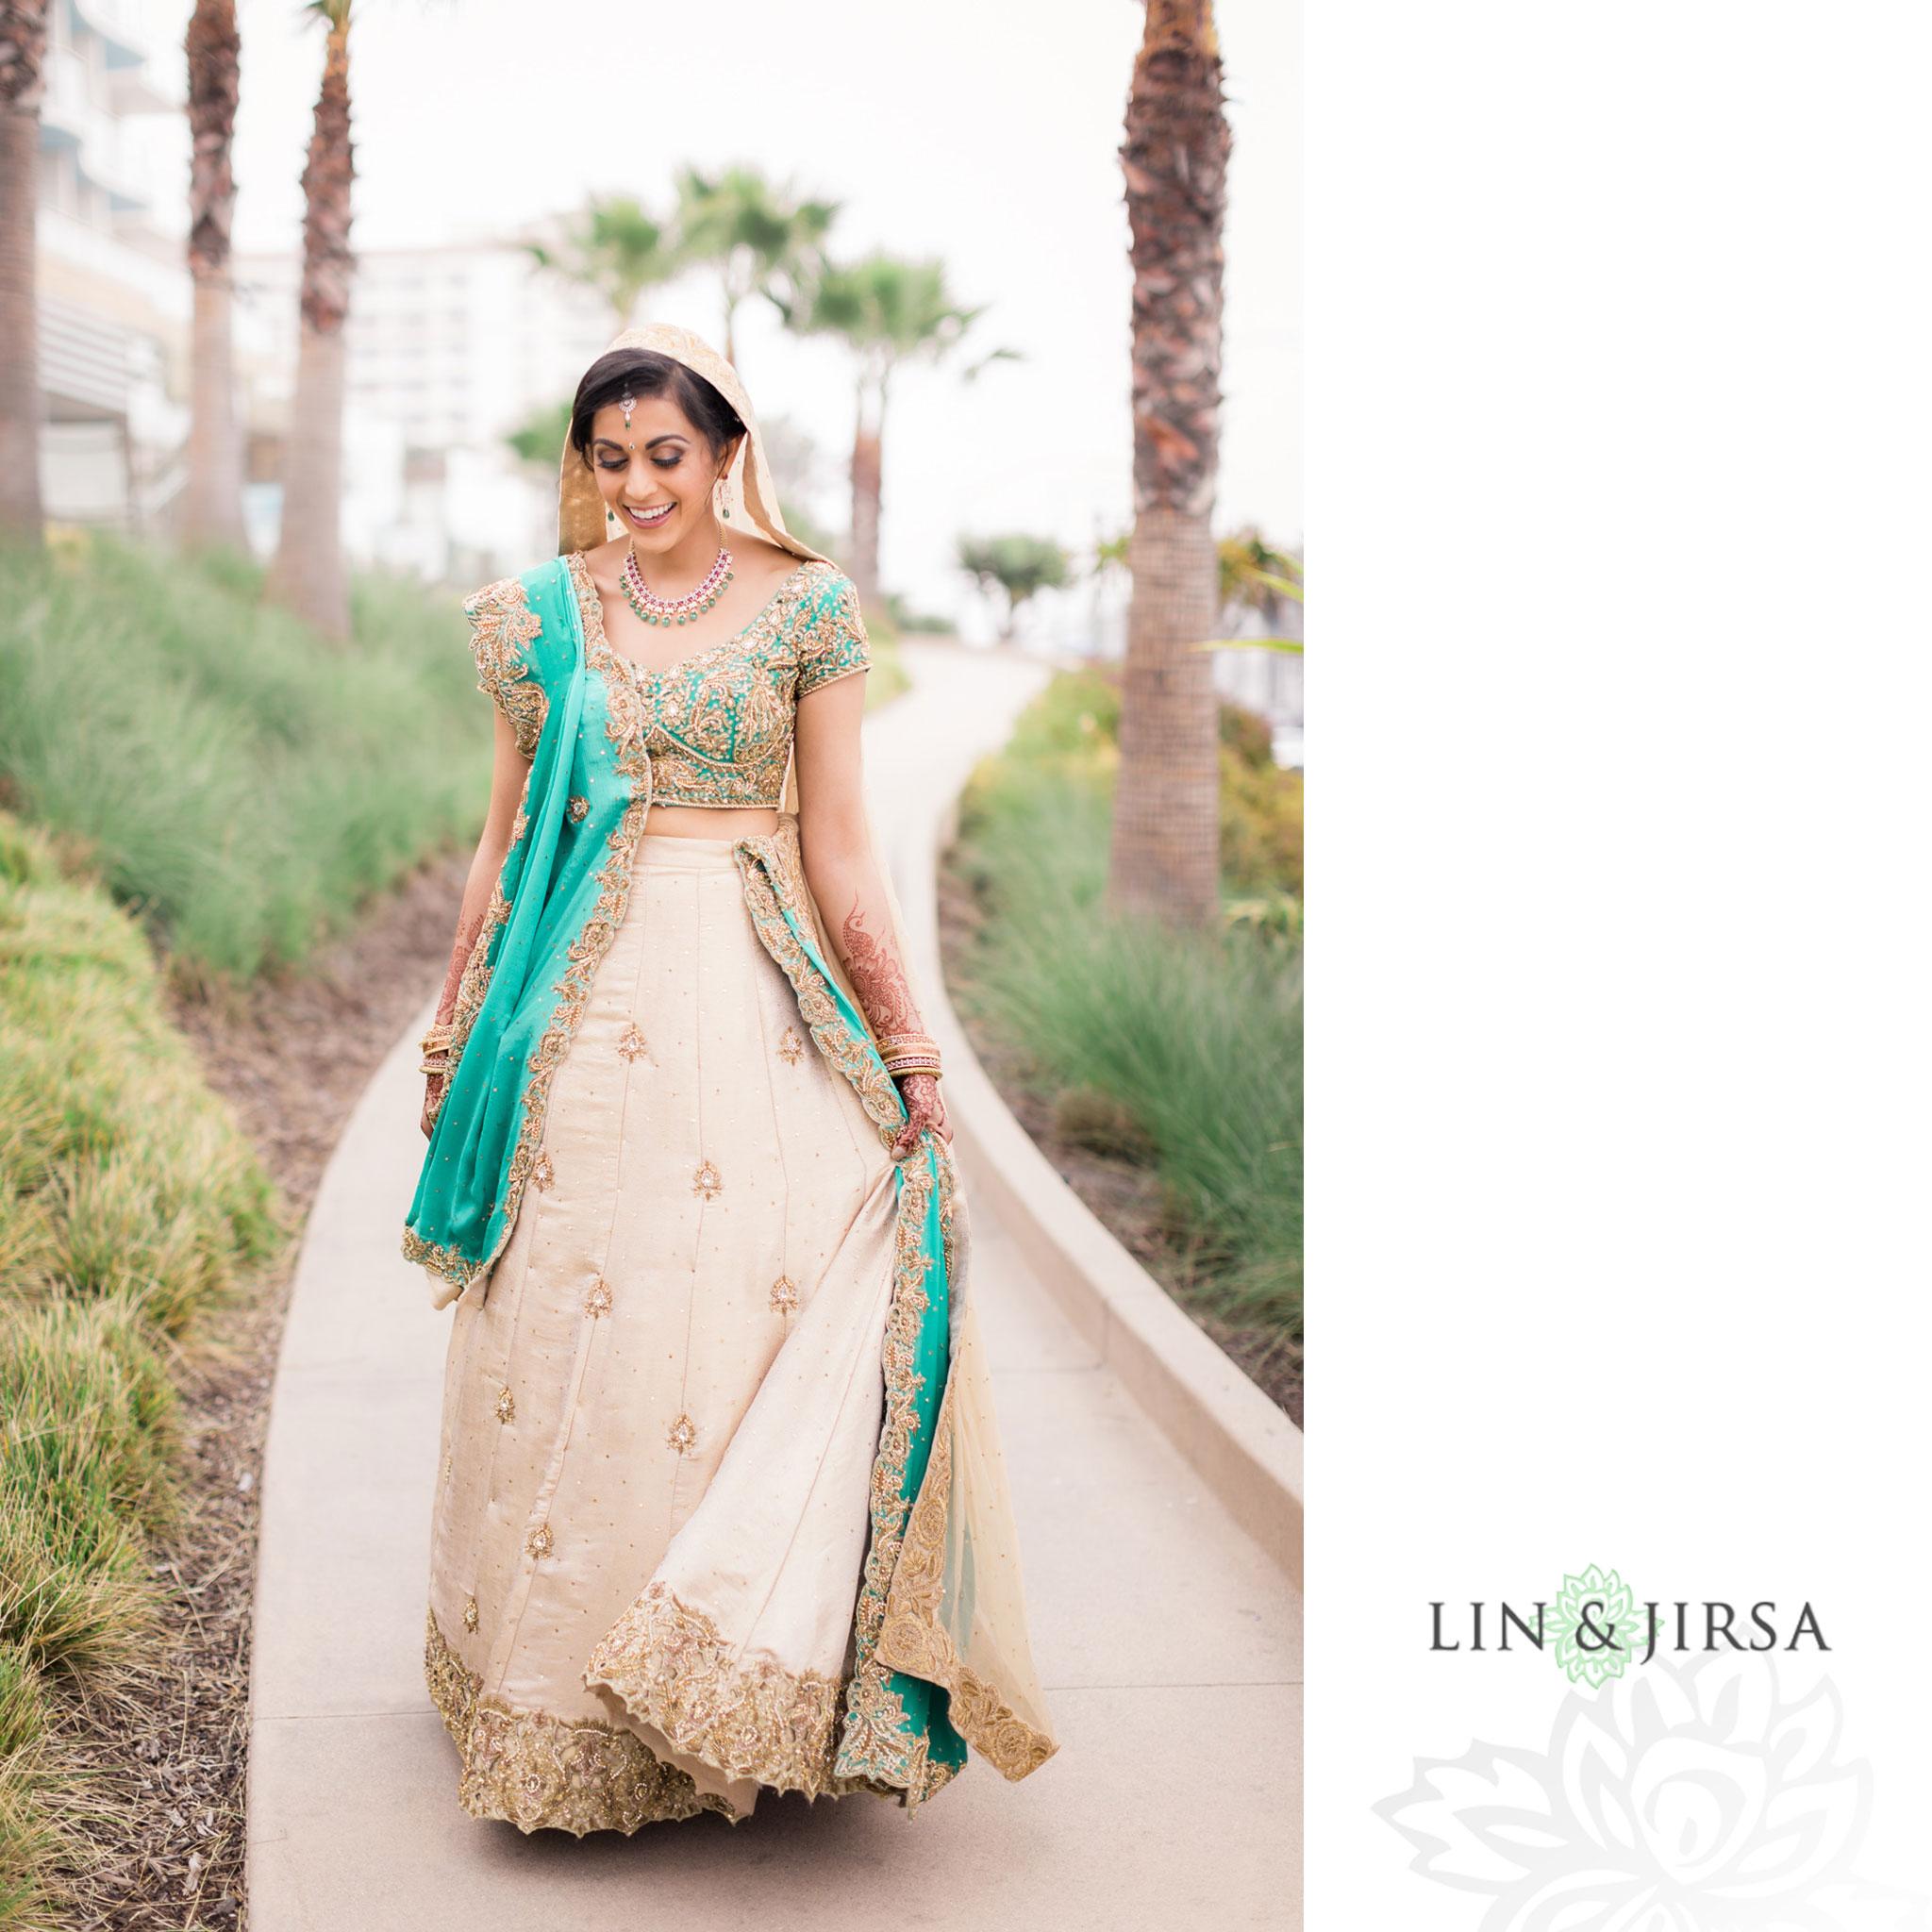 07 pasea hotel and spa huntington beach indian bride wedding photography